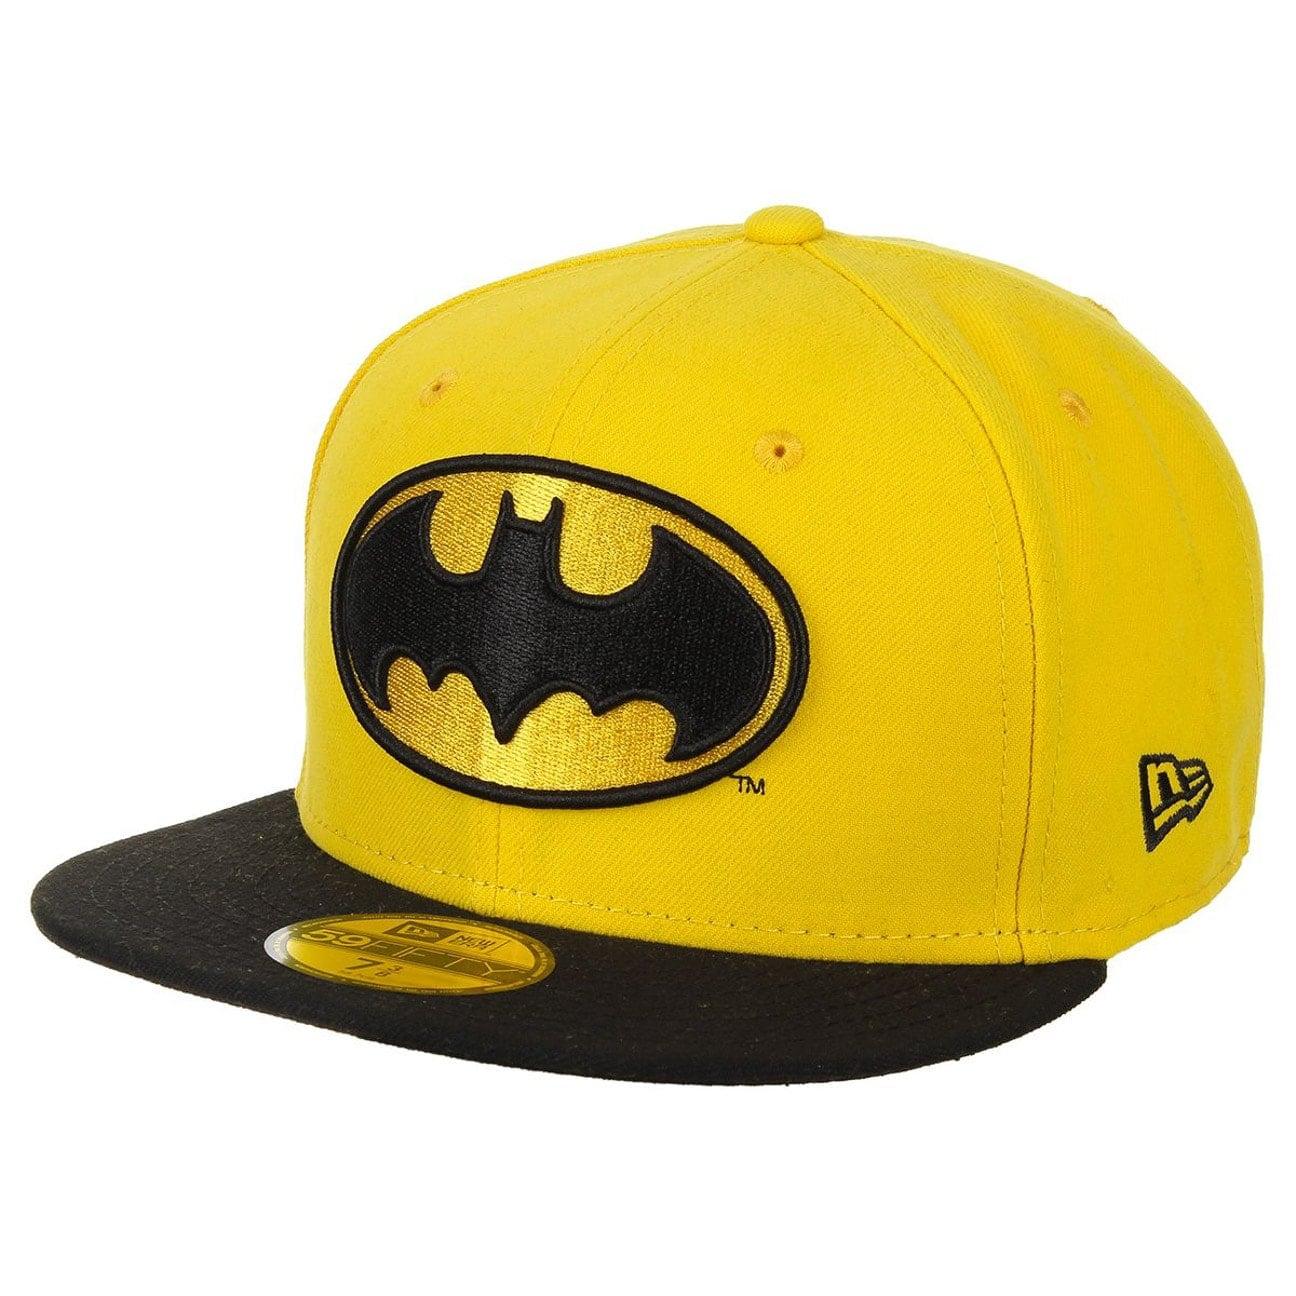 Gorra 59Fifty Batman by New Era - Gorras - sombreroshop.es 4d1f8ae3310